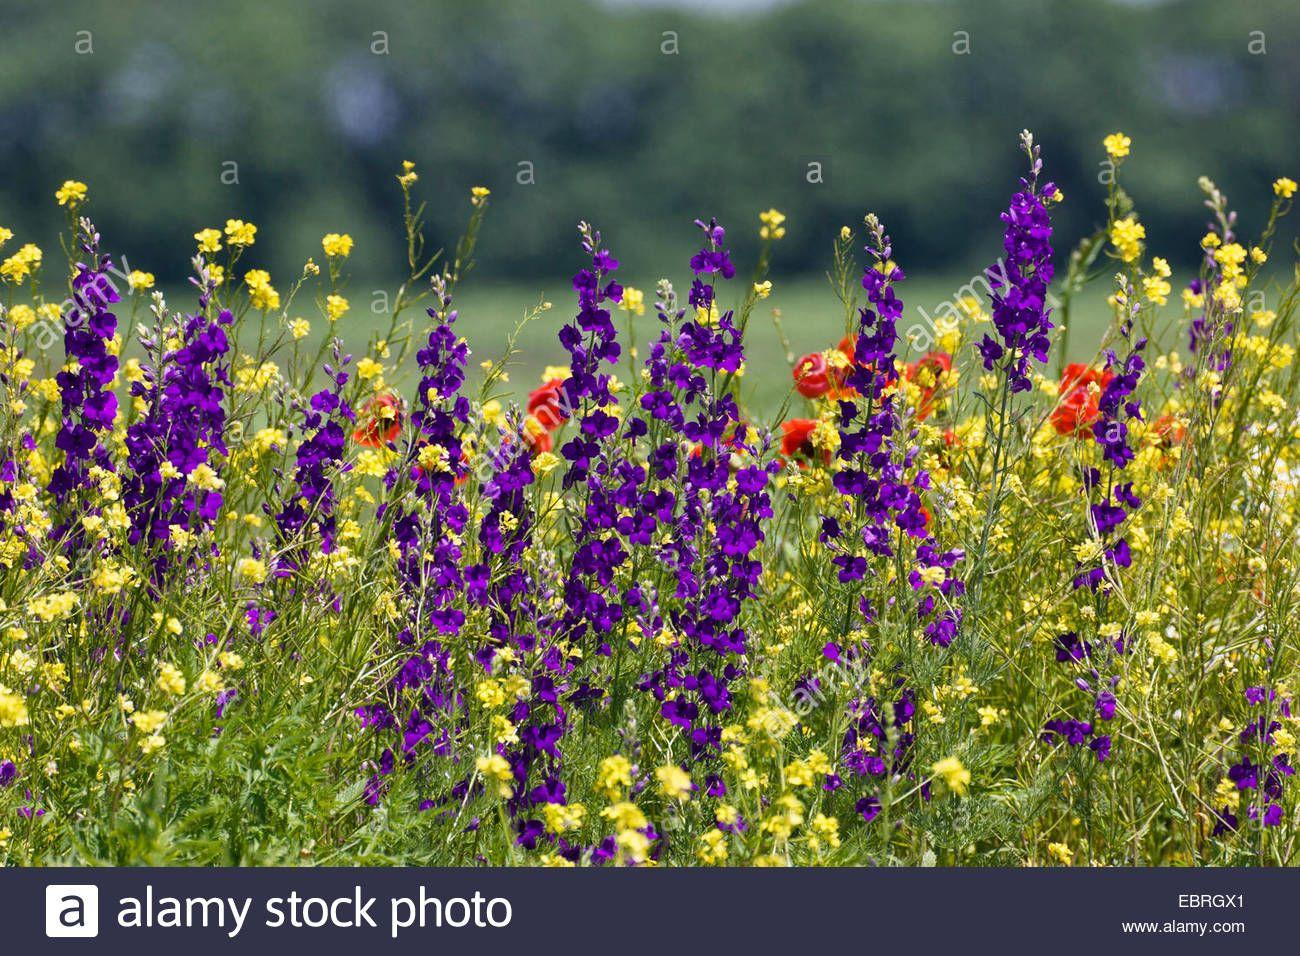 Doubtful Knight S Spur Larkspur Annual Delphinium Consolida Ajacis Delphinium Ajacis Flowering Meadow With Consolida Ambigua Delphinium Larkspur Meadow